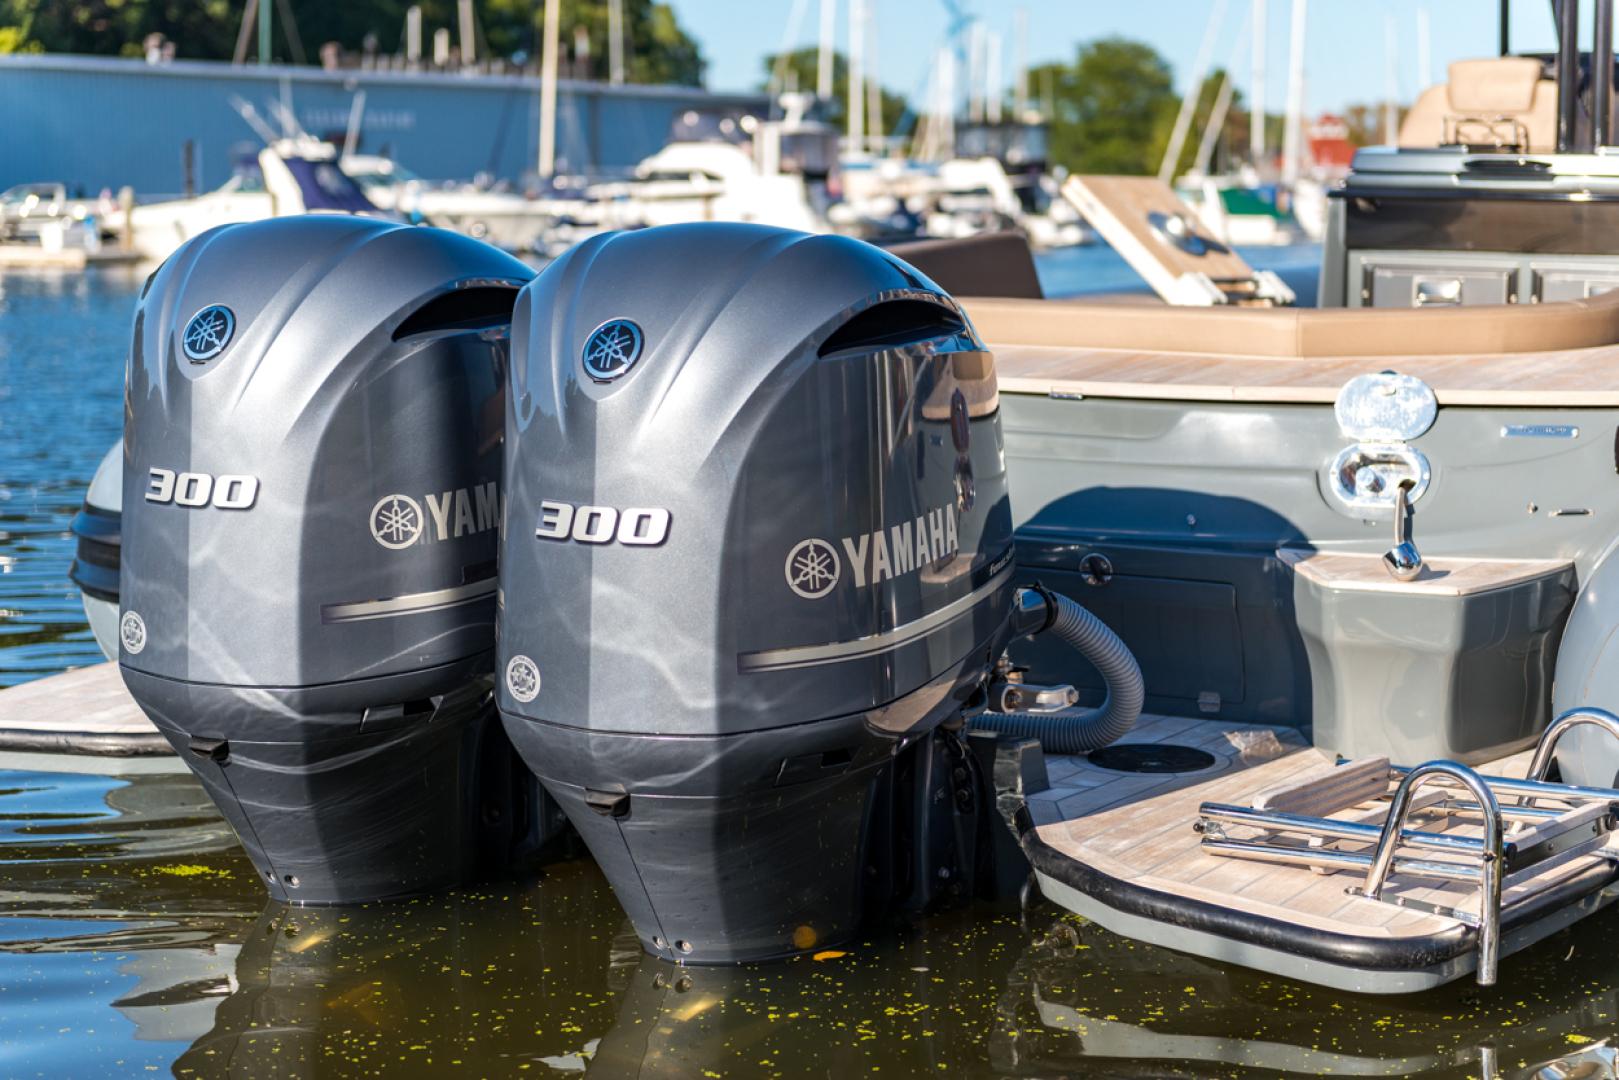 Sacs-Strider 11 2020-STRIDER 11 Fort Lauderdale-Florida-United States-1502461 | Thumbnail